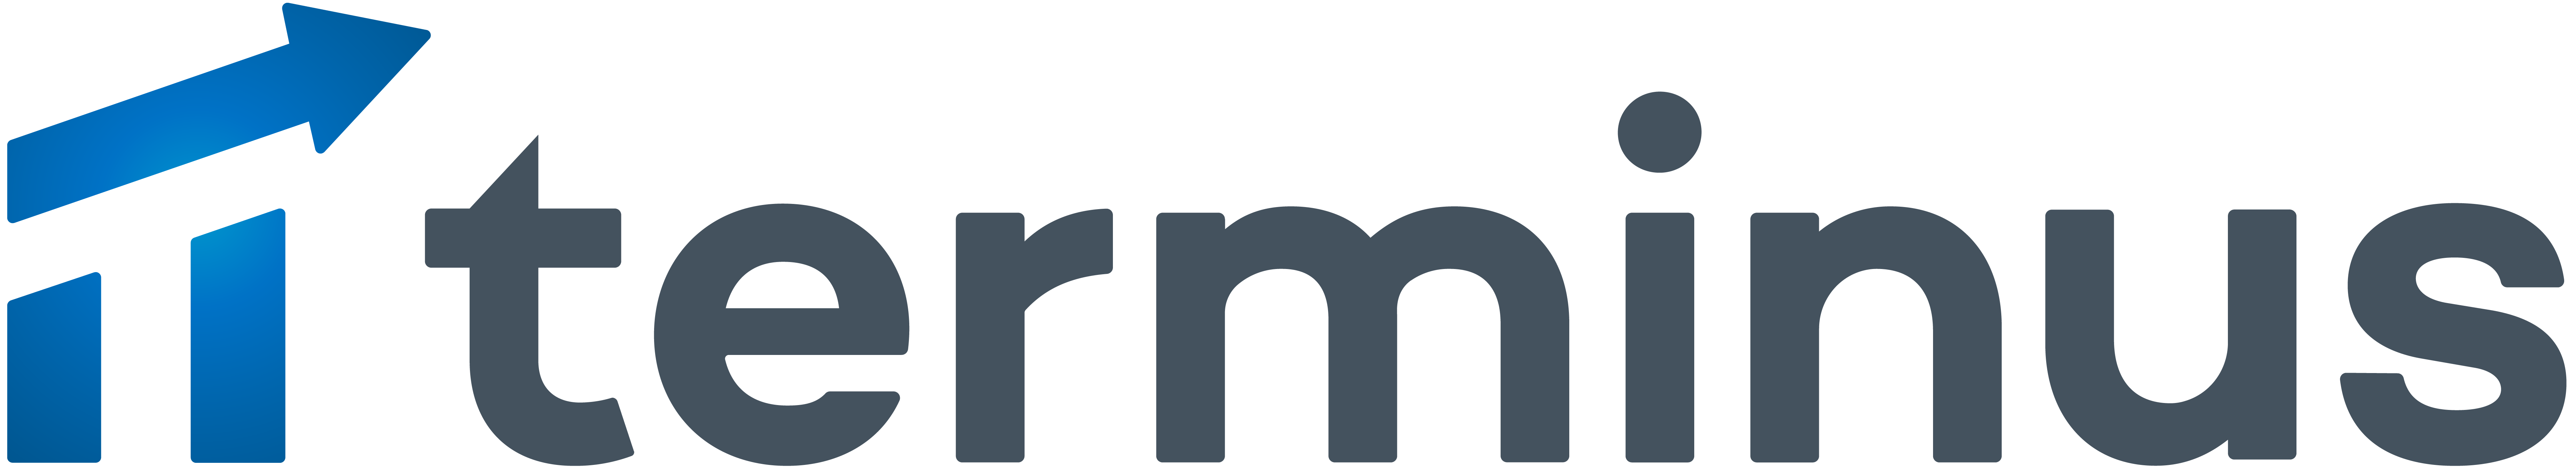 Terminus company logo.